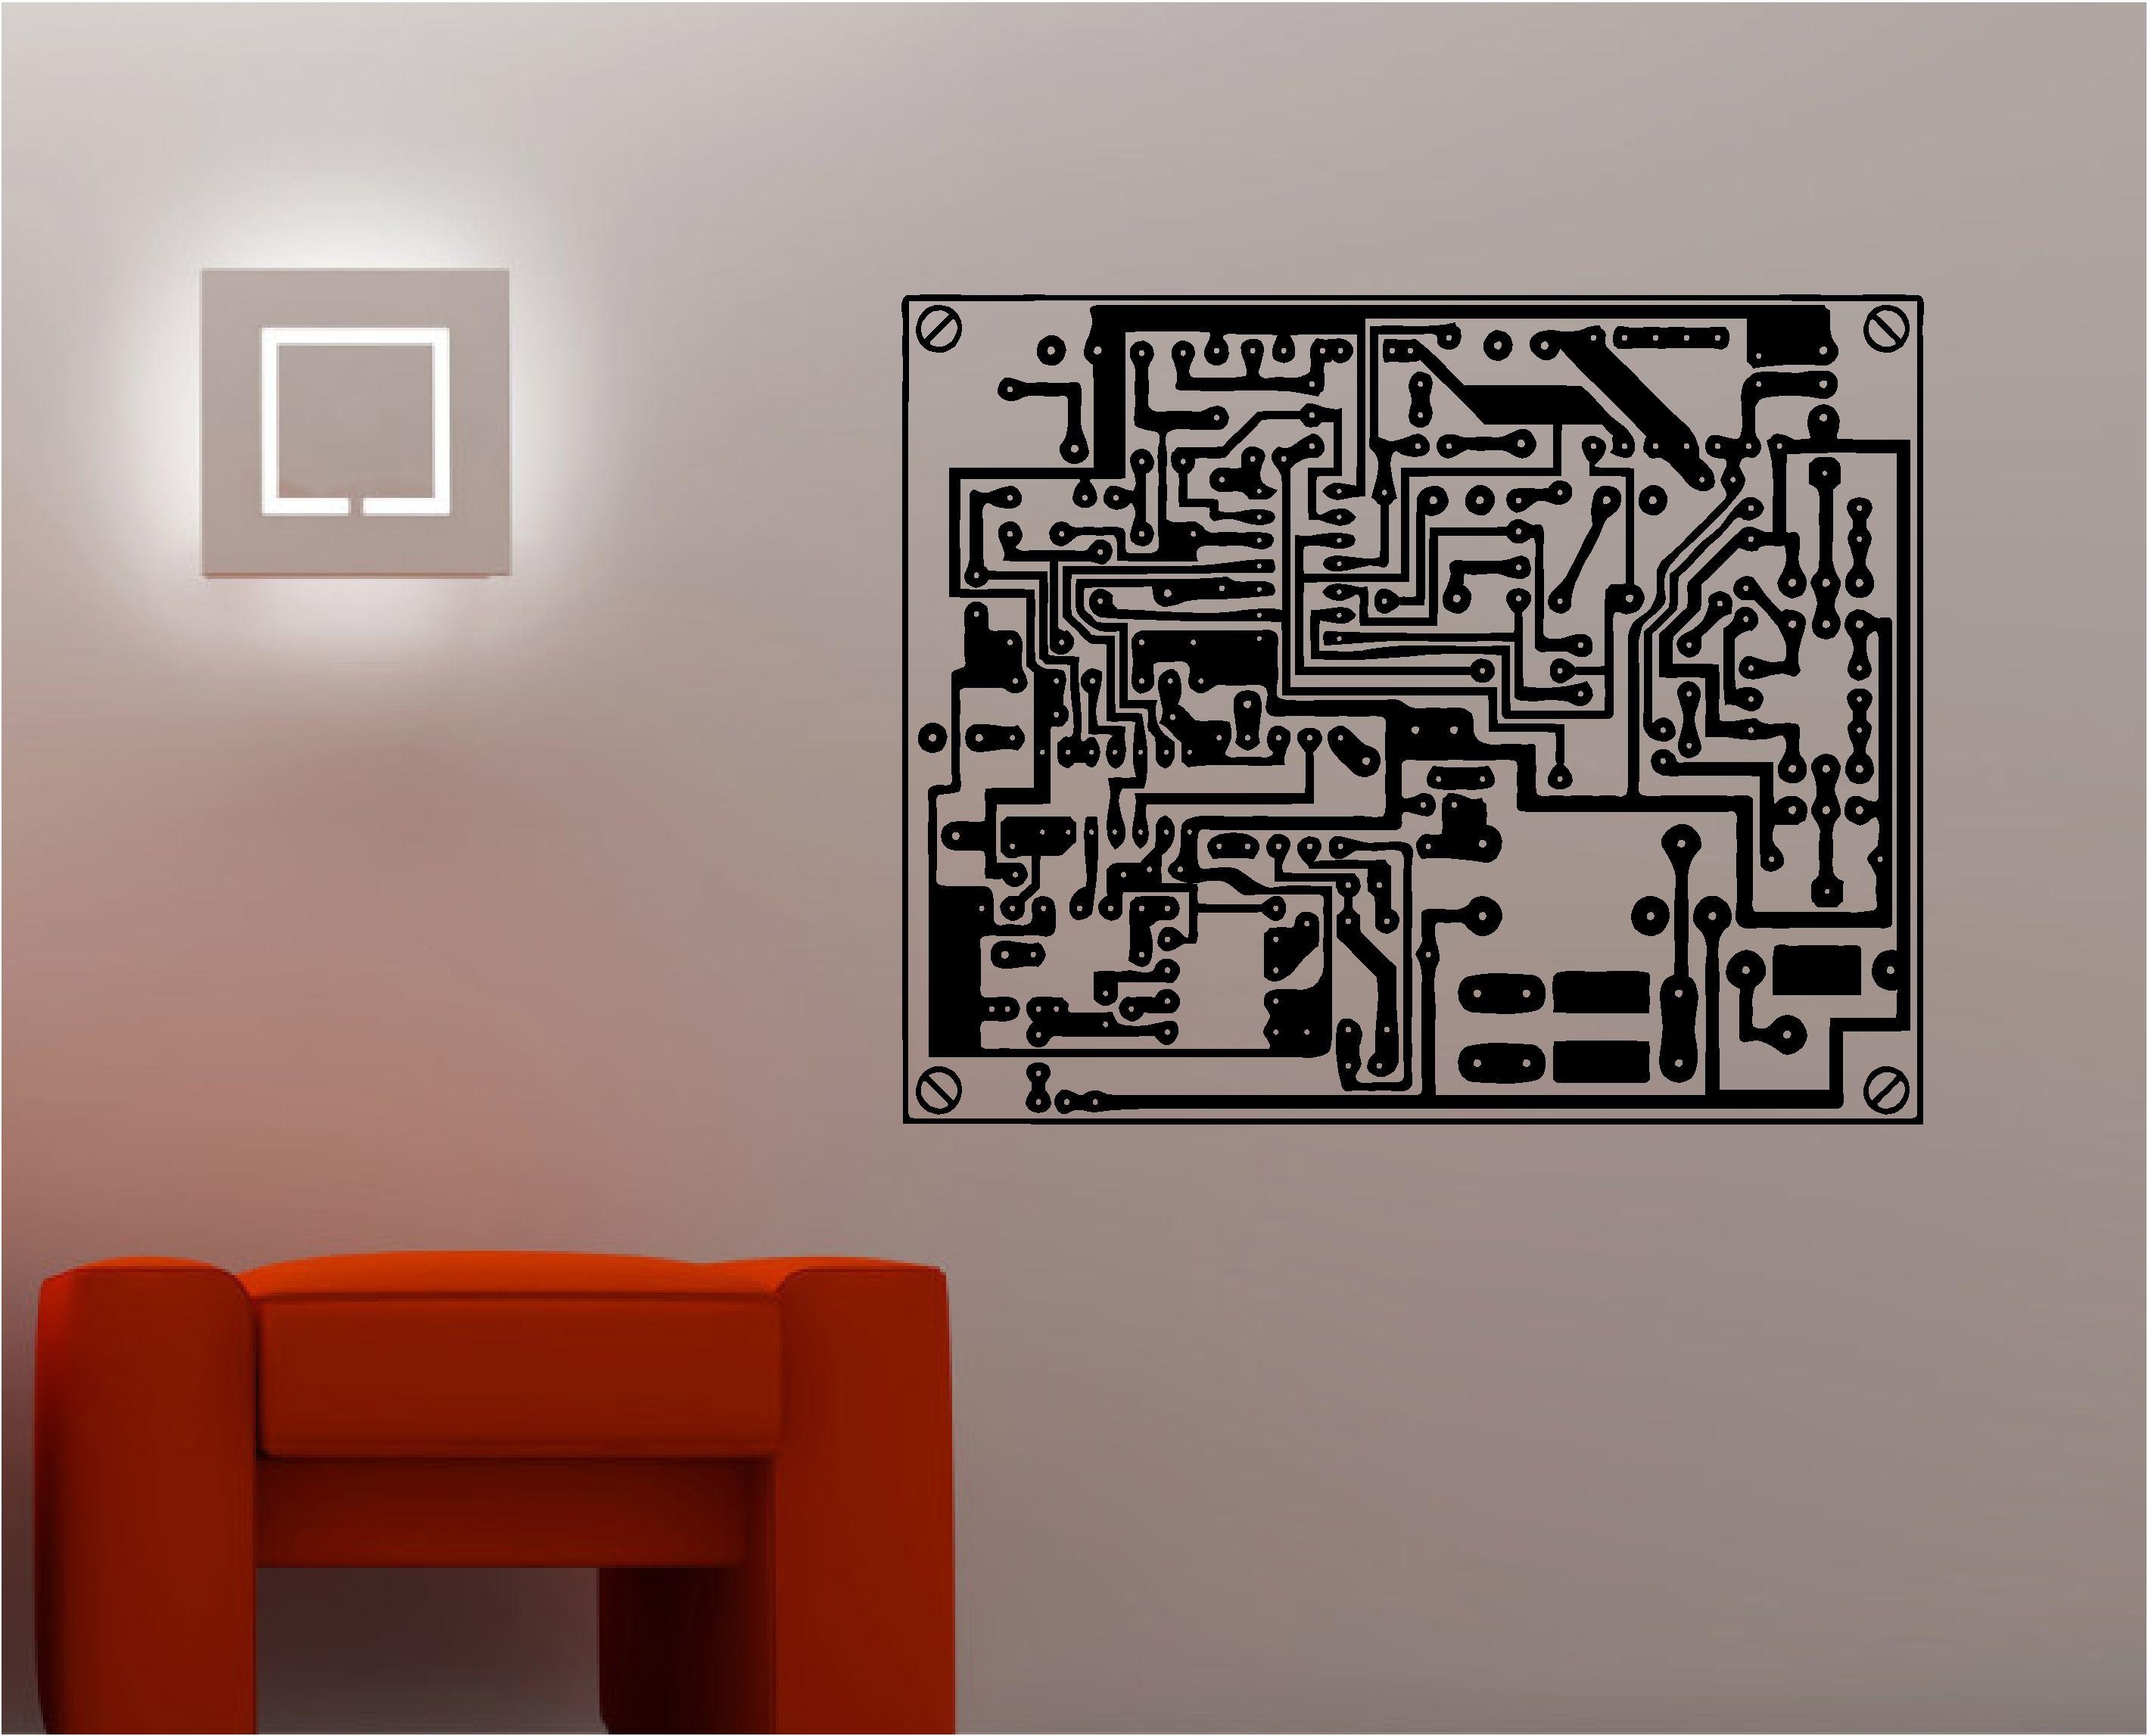 Grunge Circuit Board Design Using Electronic Circuit Patterns And